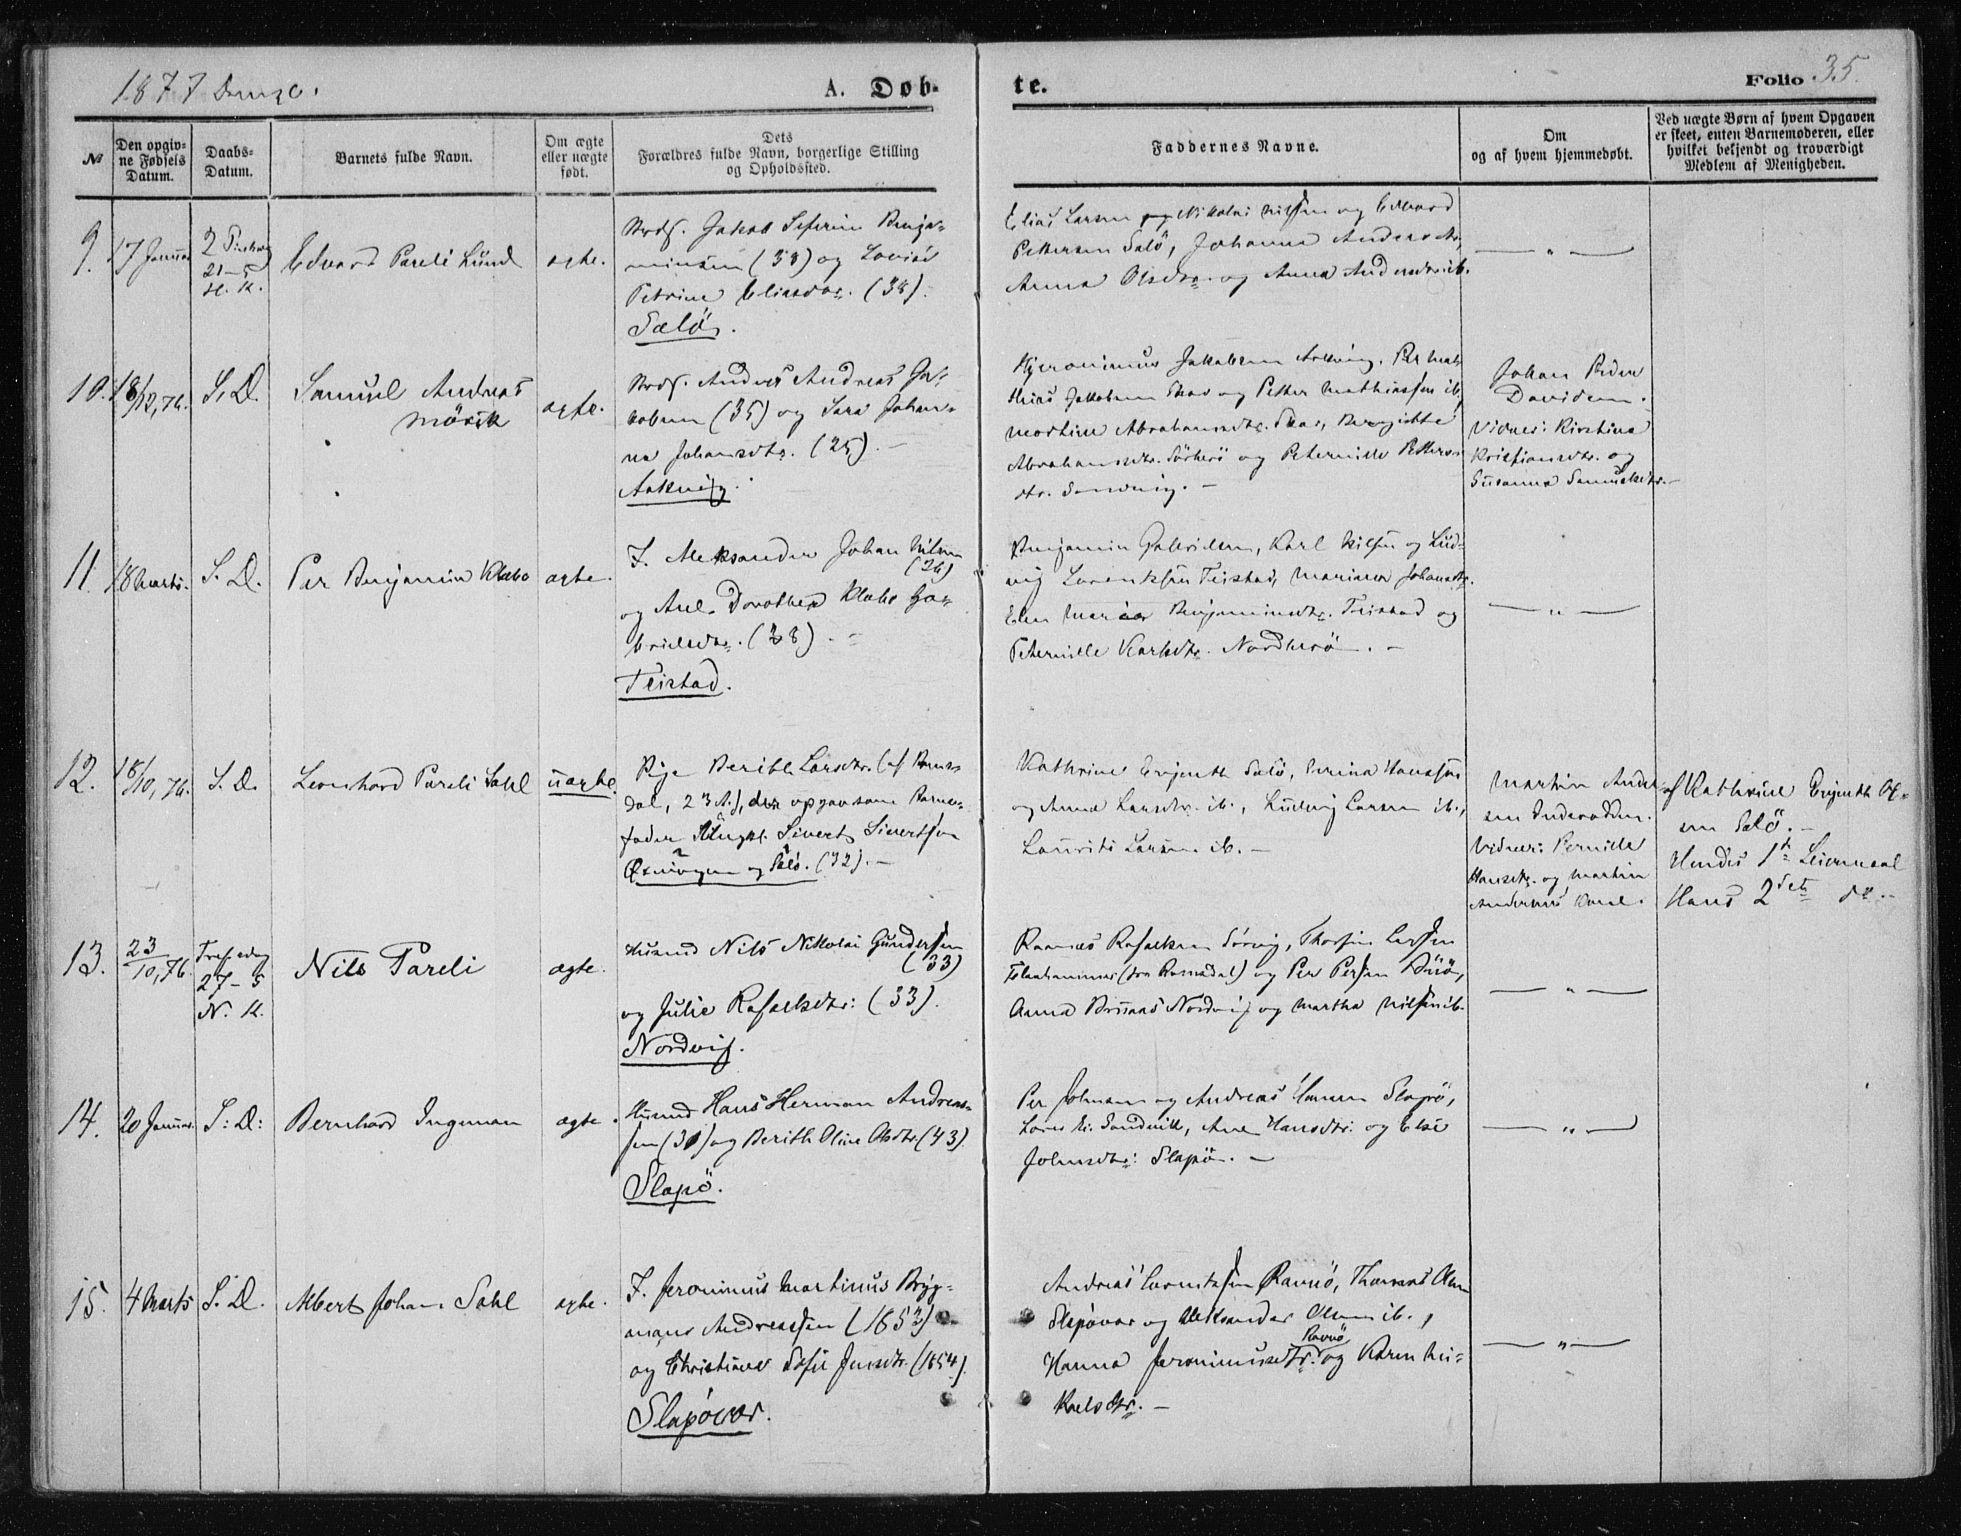 SAT, Ministerialprotokoller, klokkerbøker og fødselsregistre - Nordland, 834/L0506: Ministerialbok nr. 834A04, 1872-1878, s. 35